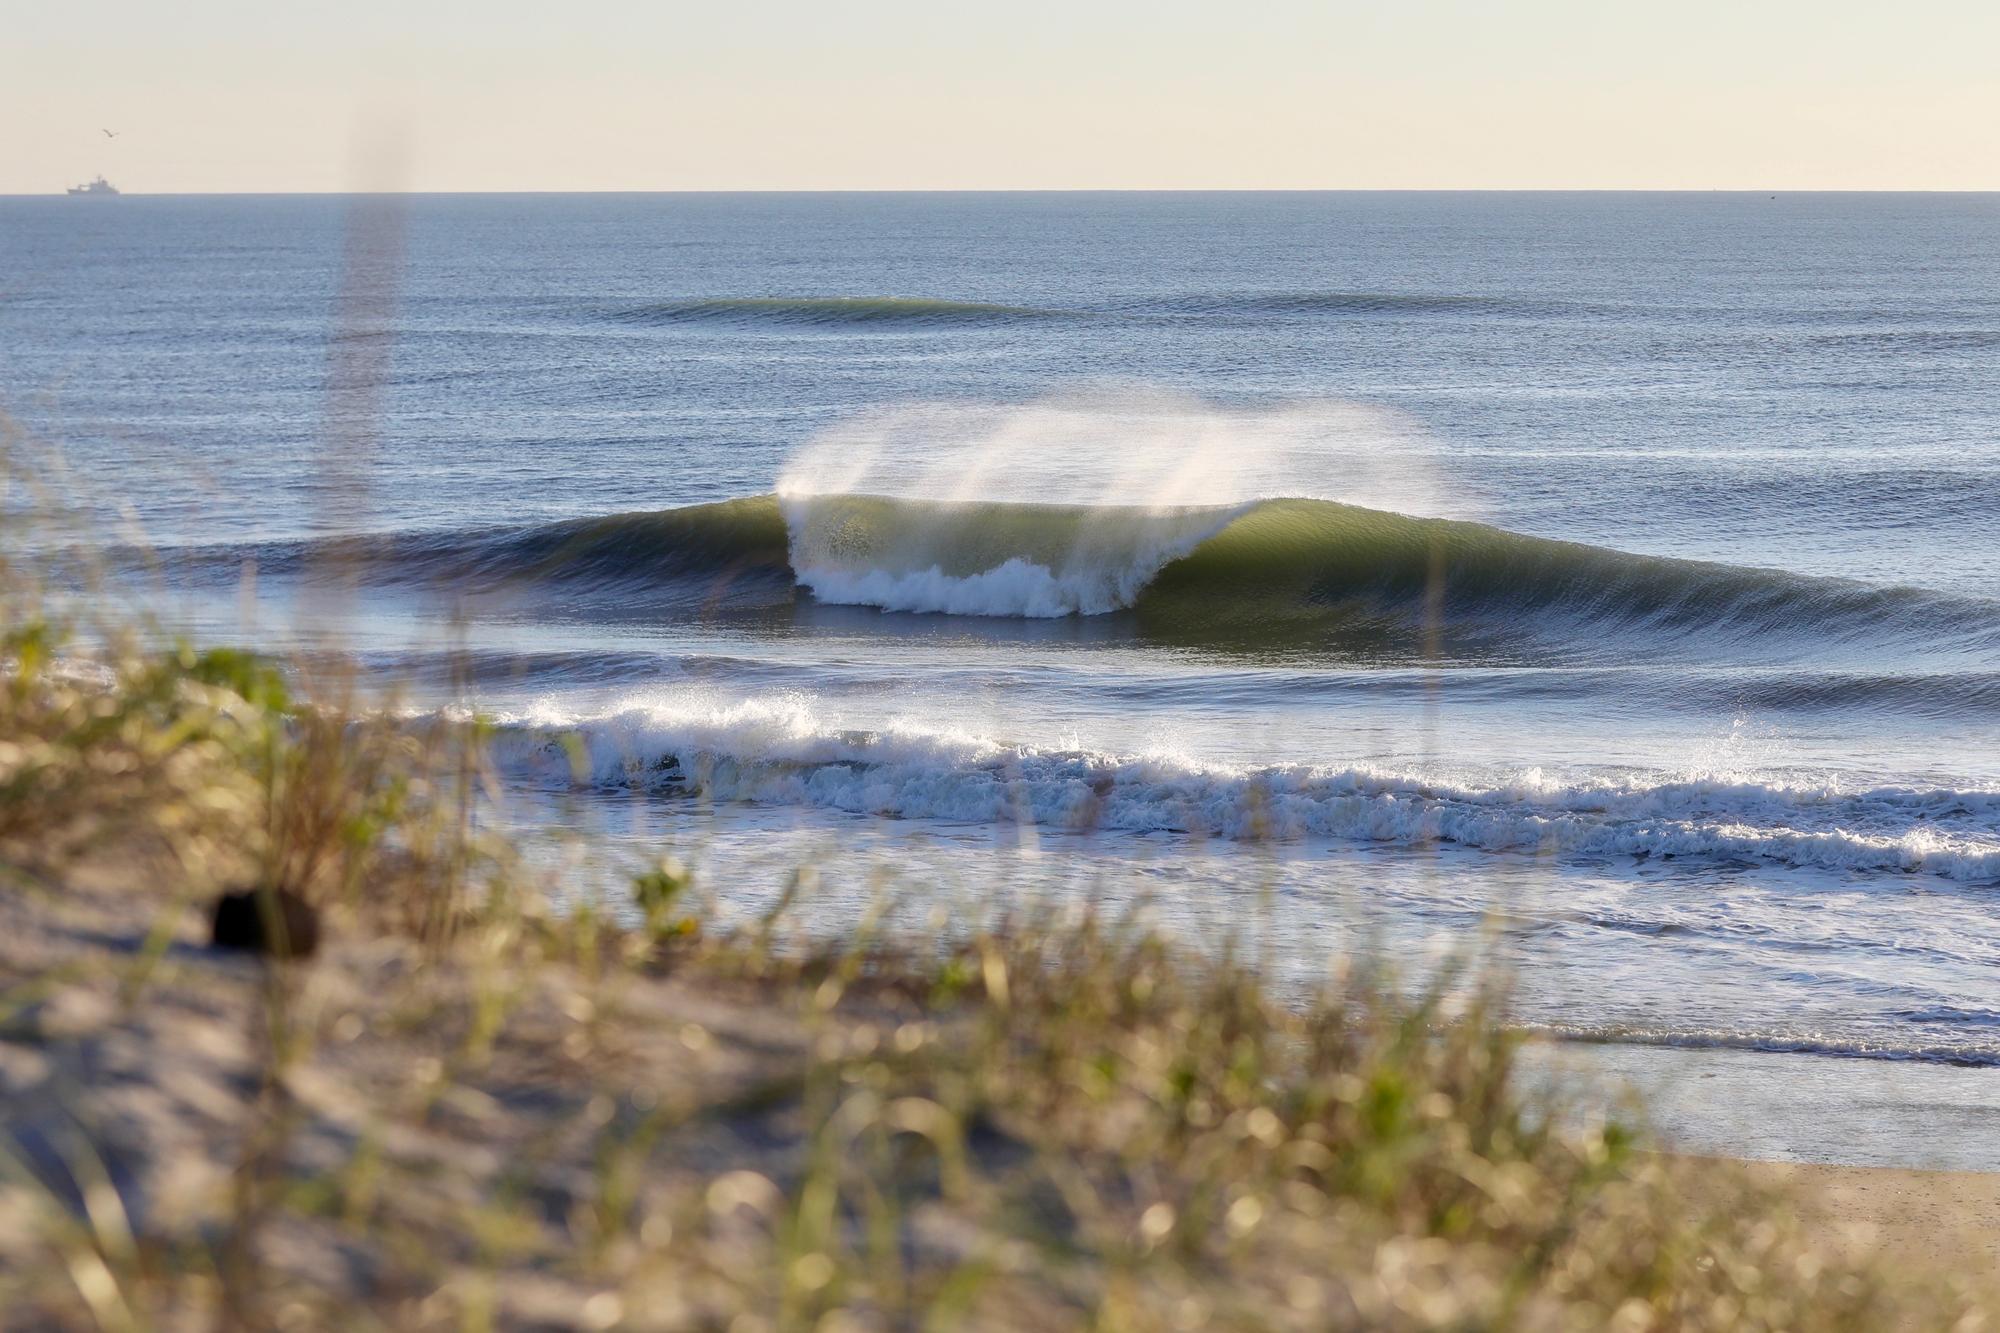 gulf coast: Surf News, Videos & Photos at Surfline